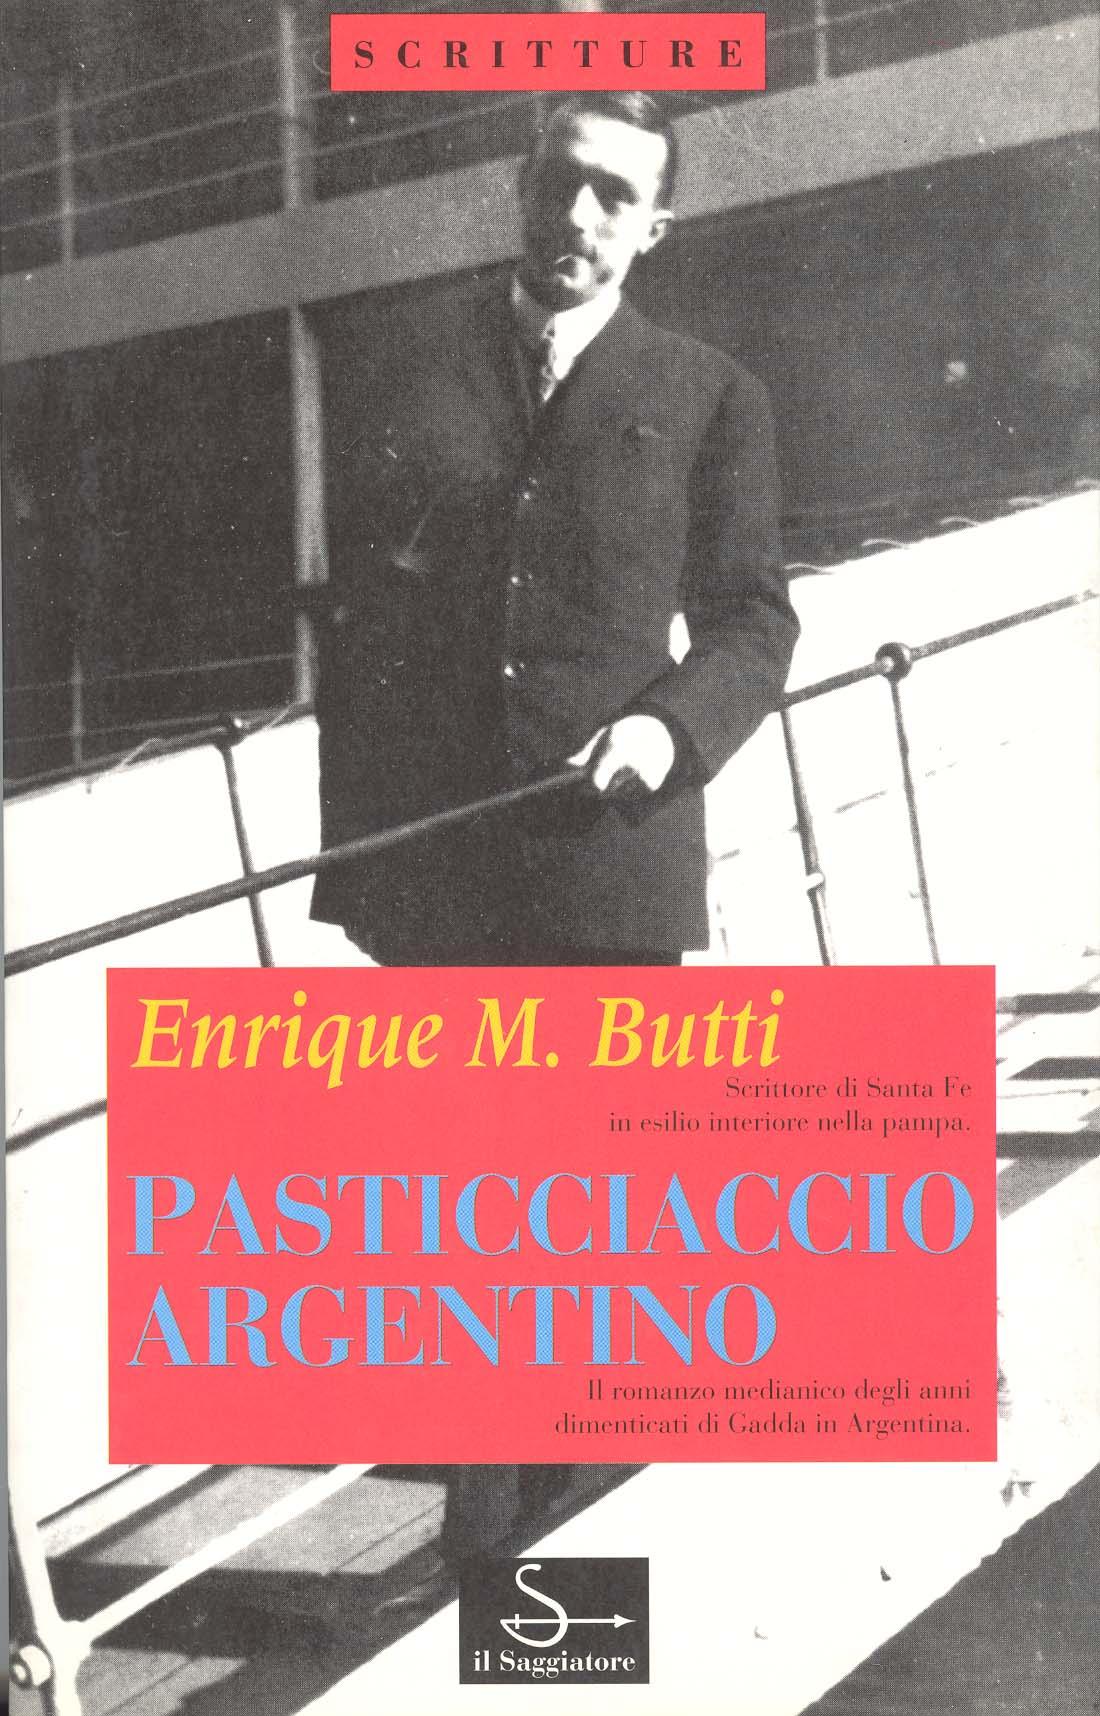 Pasticciaccio argentino